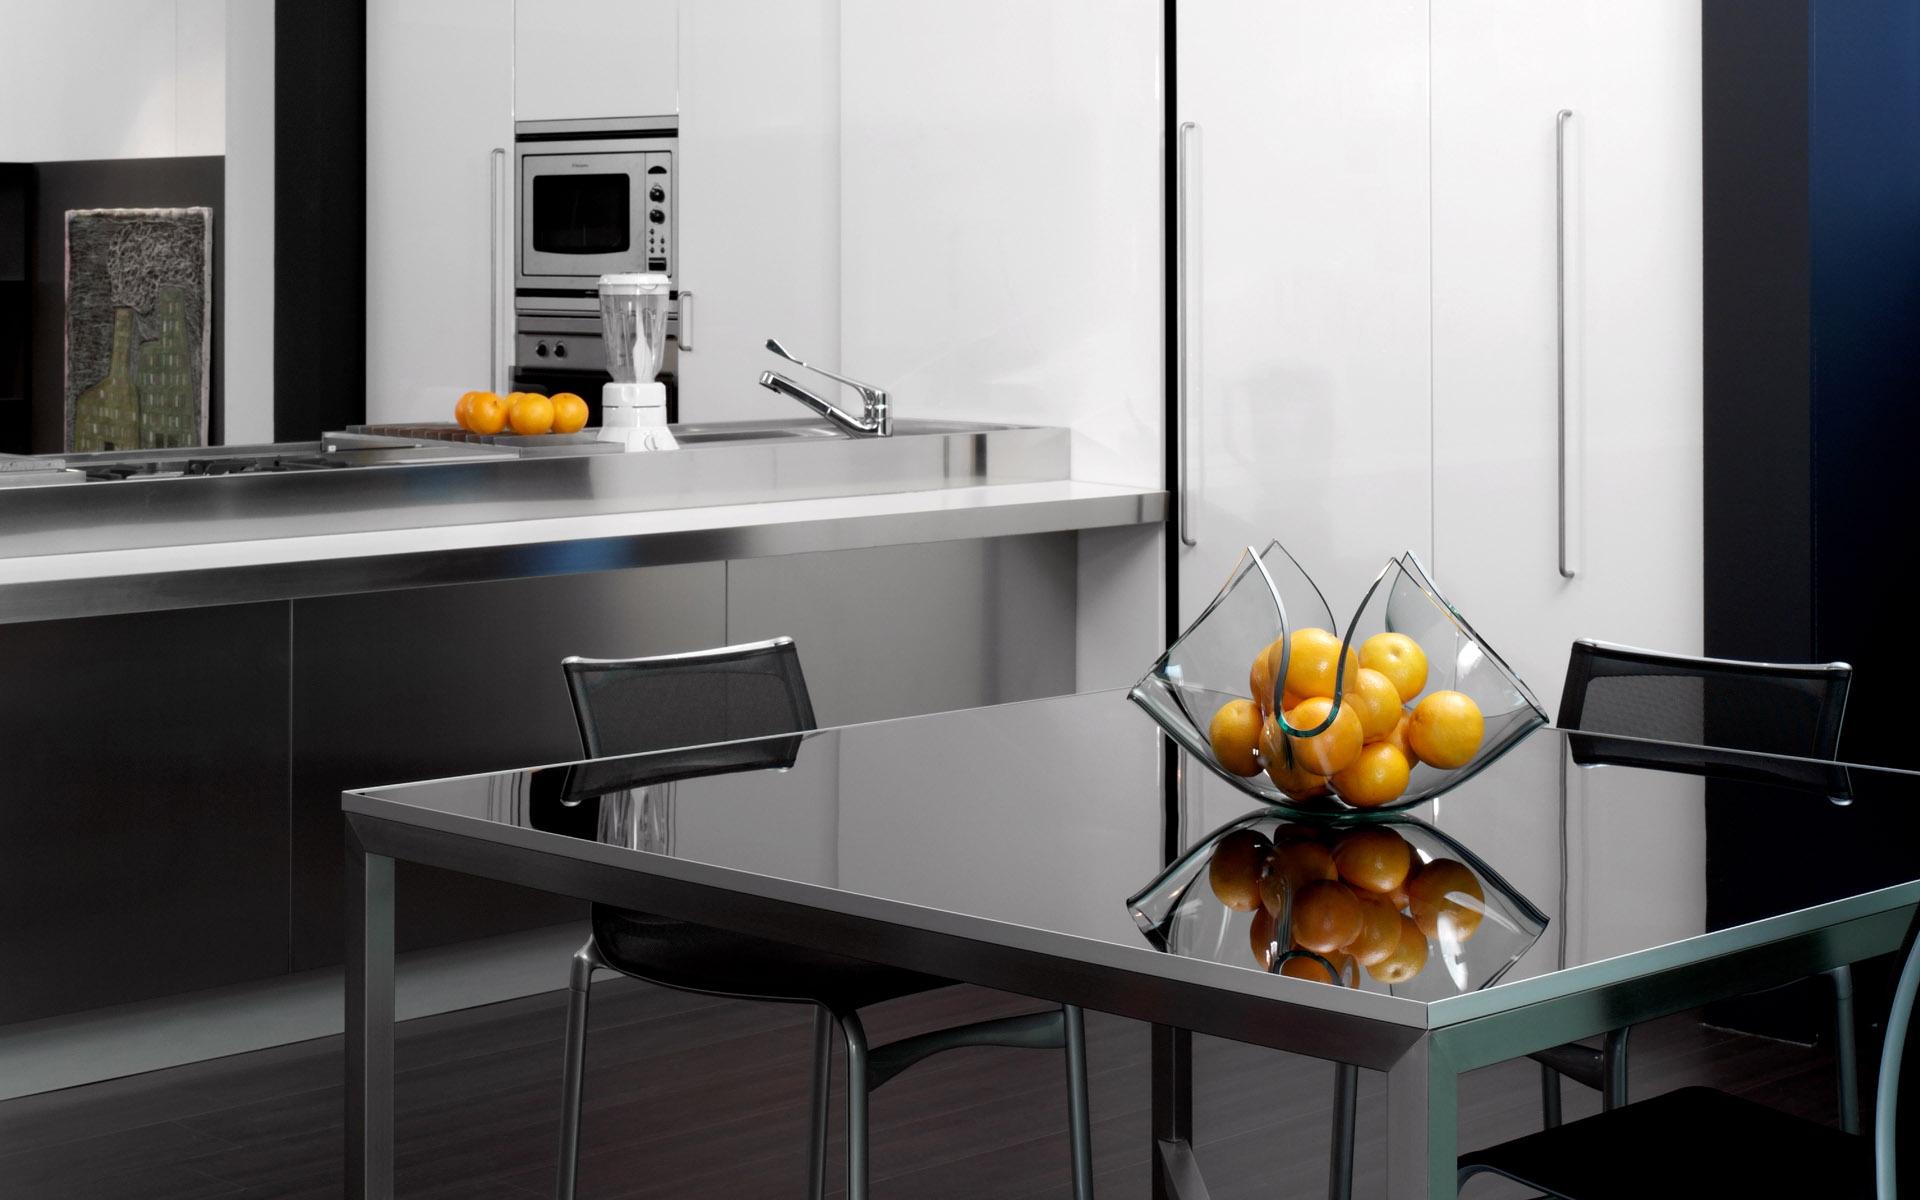 kitchen-design-ideas4 kitchen design ideas